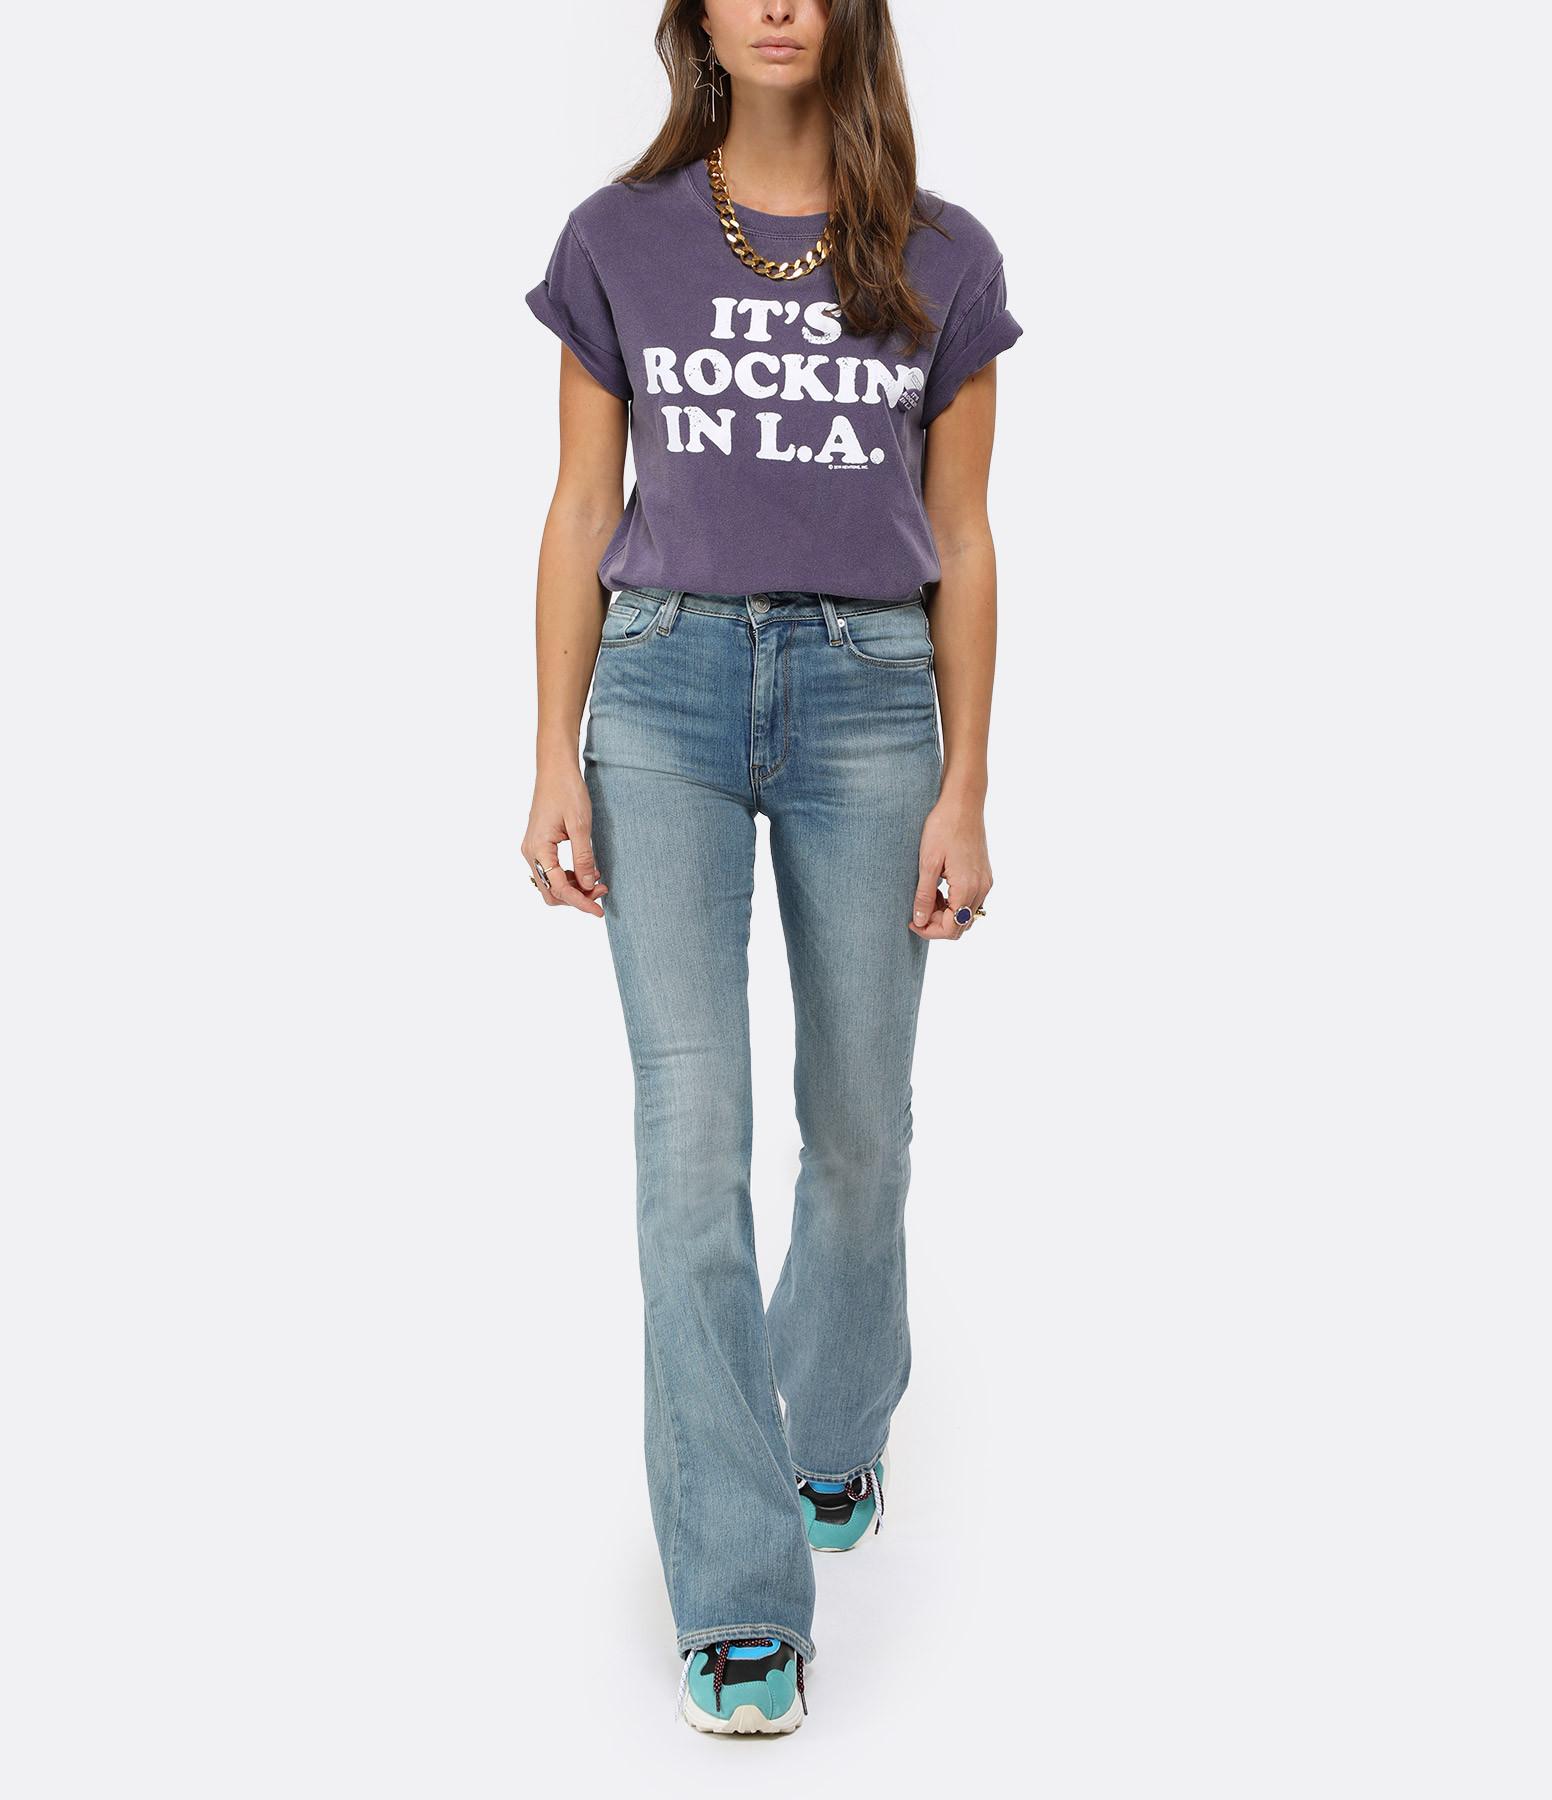 NEWTONE - Tee-shirt Rockin Coton Violet Grappe